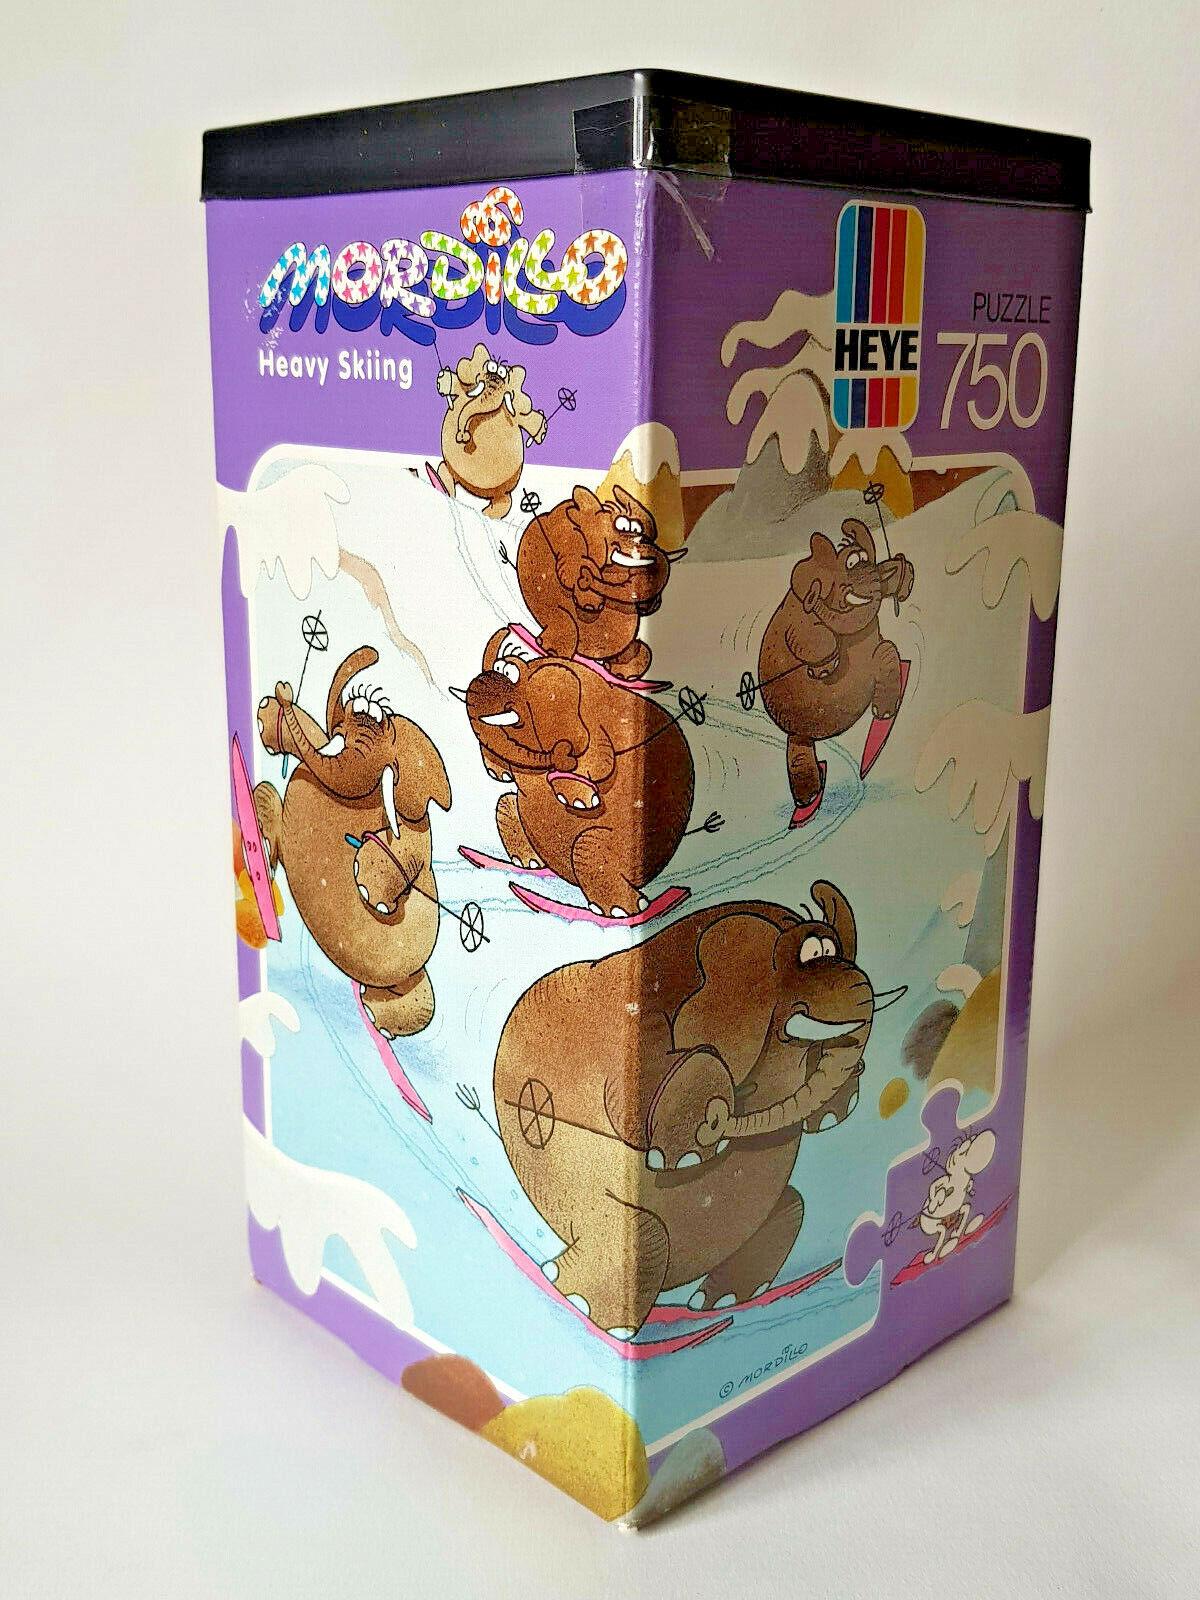 Heye MORDILLO Lourd Ski Vintage 1989 750 piece Jigsaw  Puzzle + plan Excellent  prix de gros